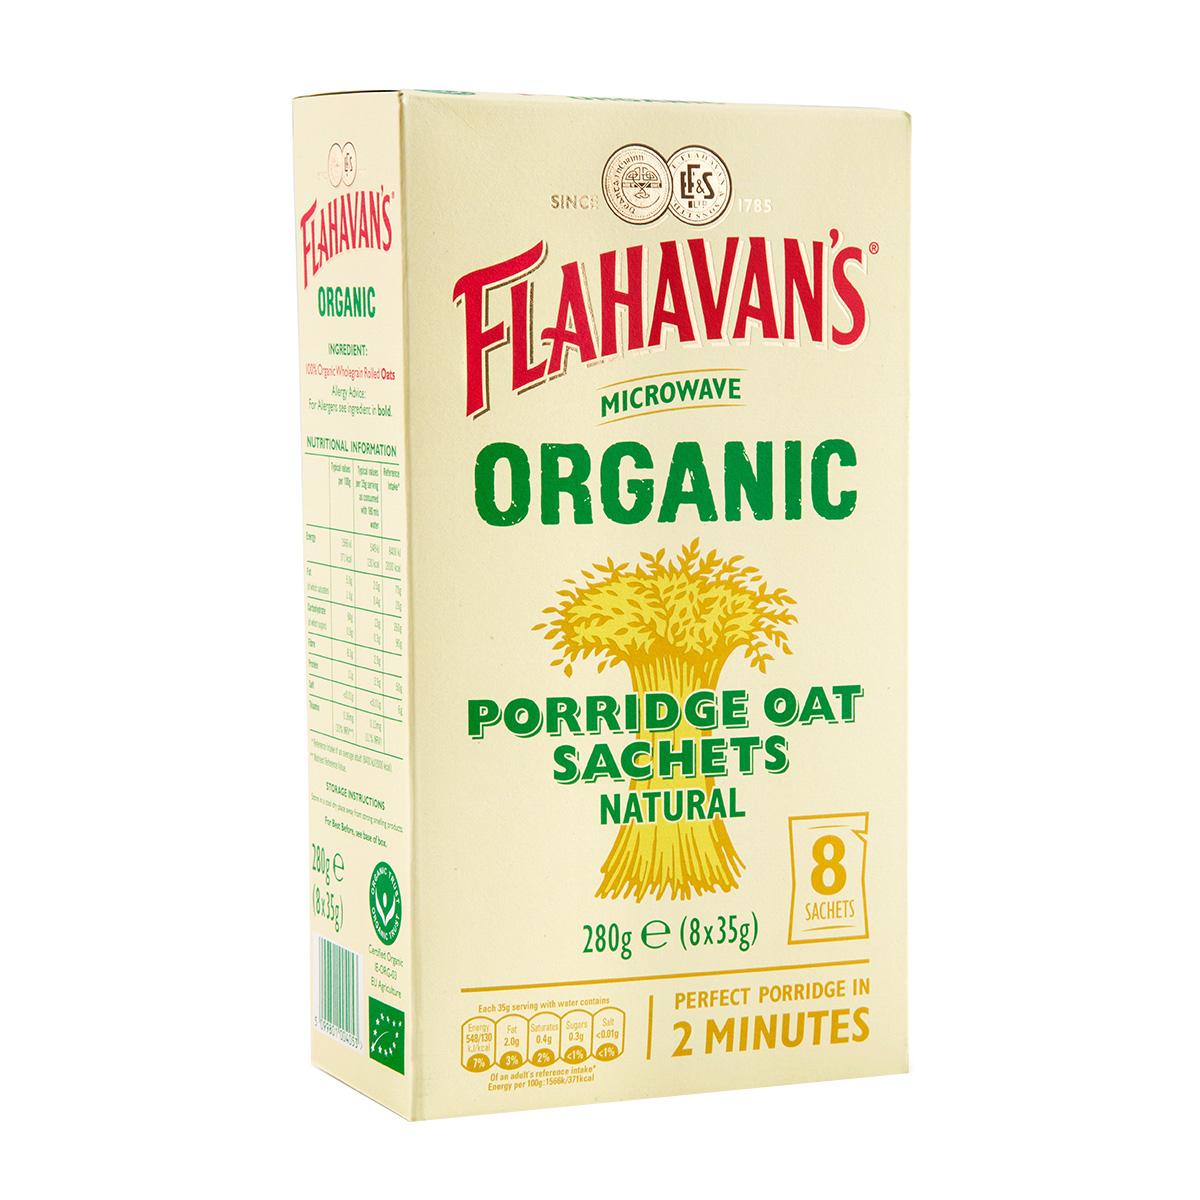 Flahavan's Irish Porridge Oats Naturally Creamy Original (350gm)